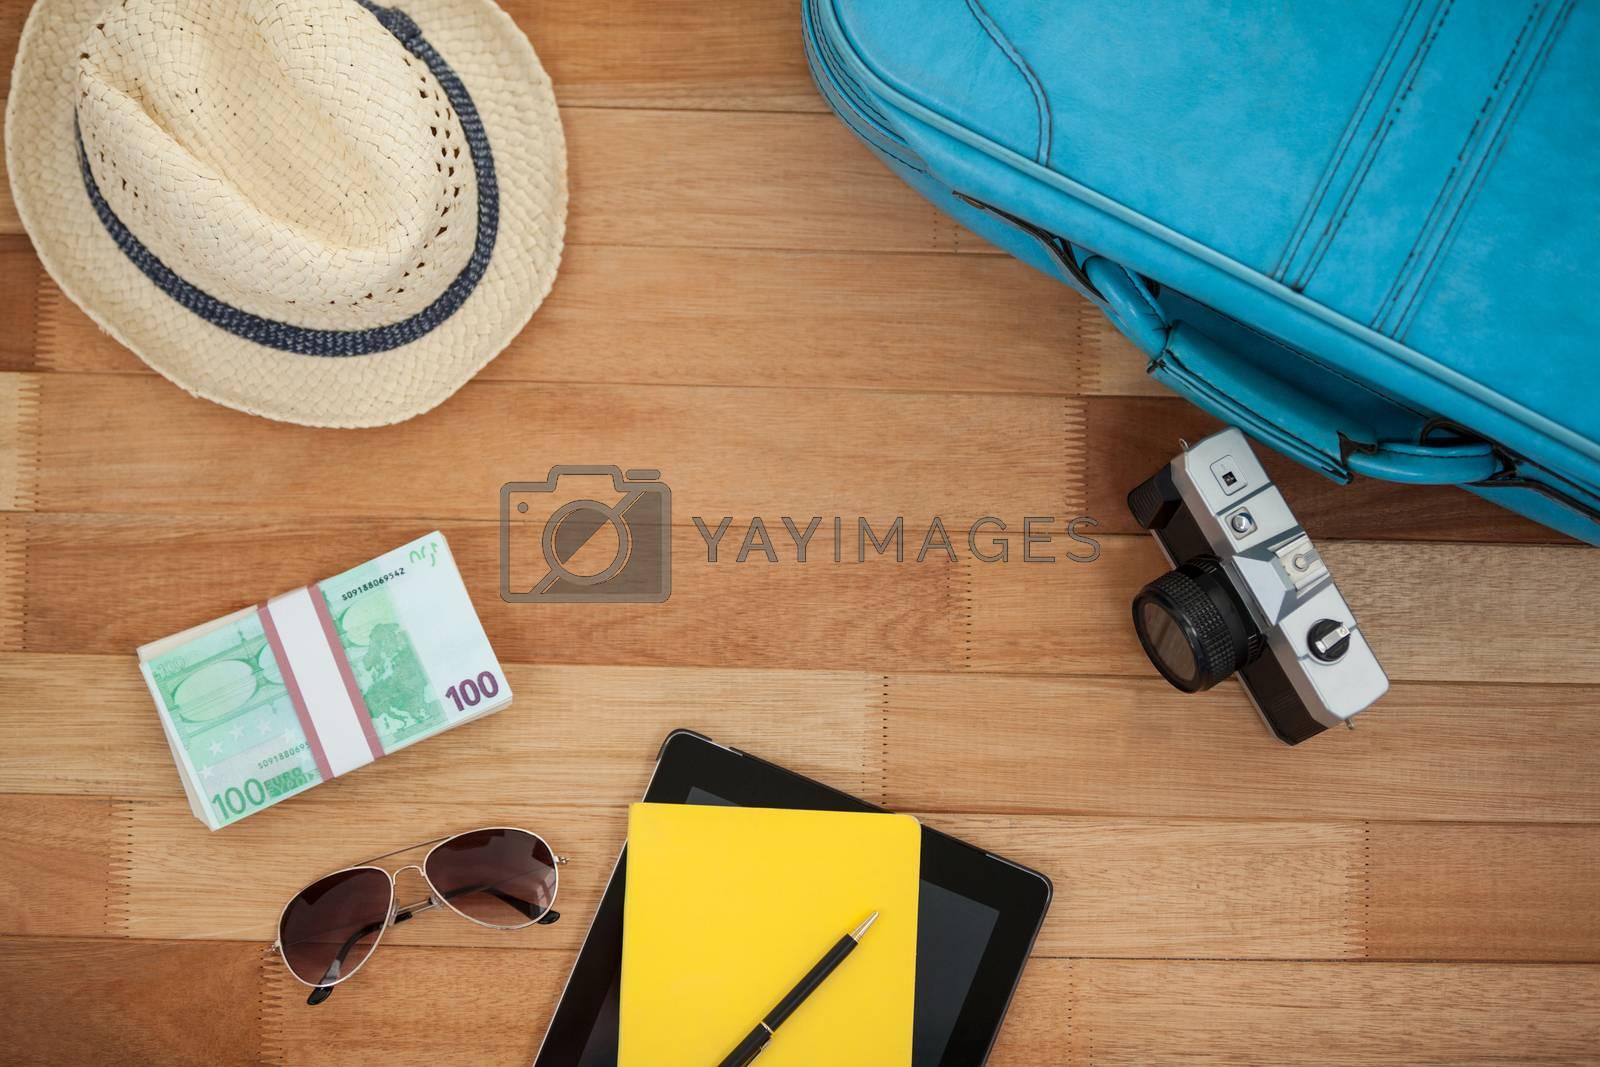 Travel accessories on wooden floor by Wavebreakmedia